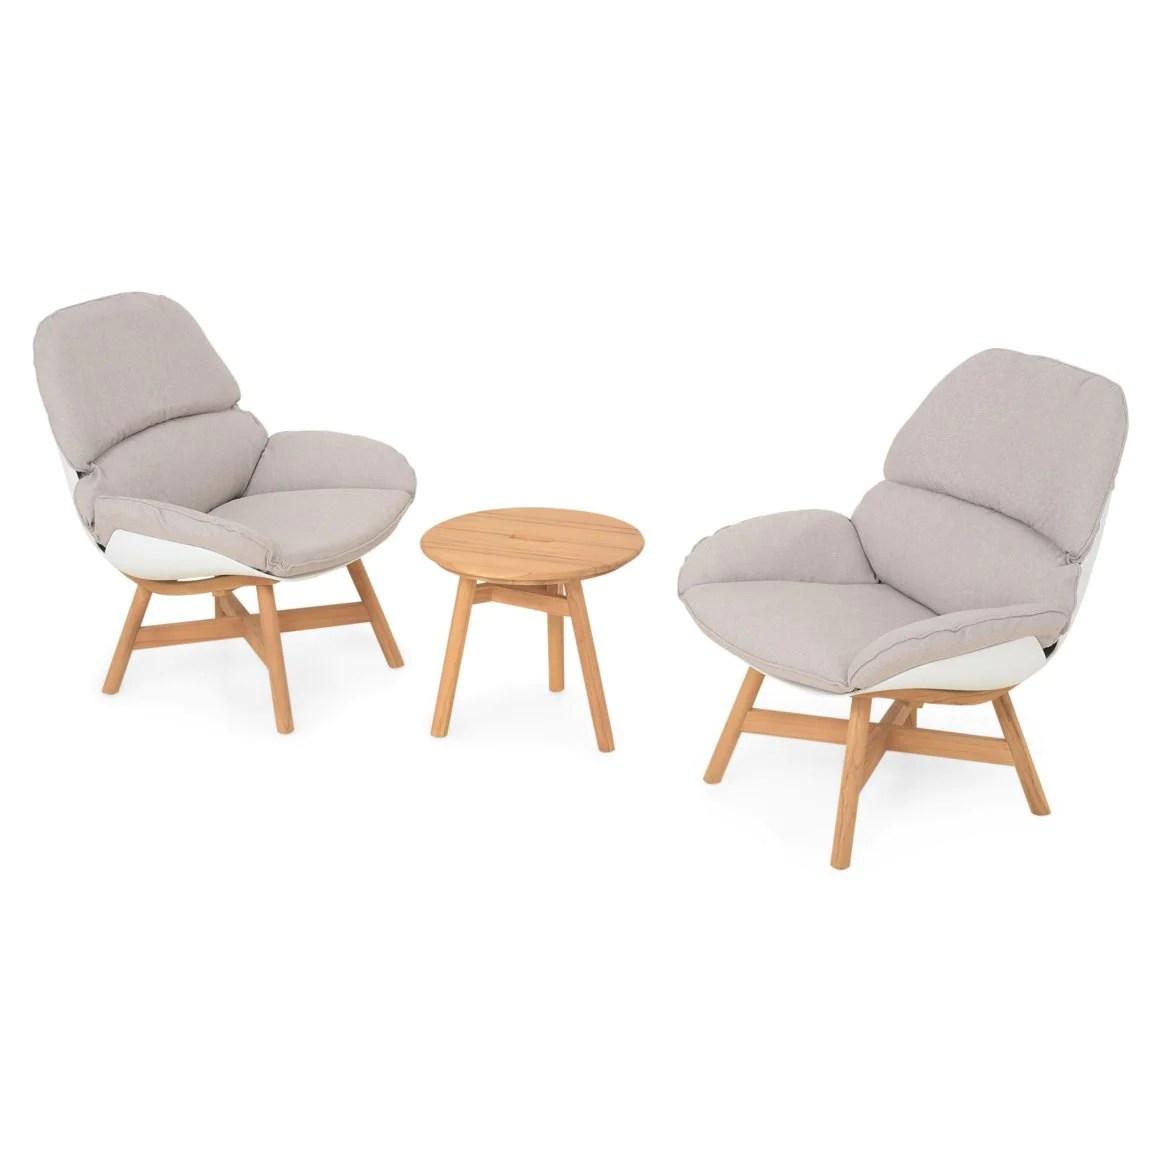 Mobexpert Blog. Întreținere mobilier exterior